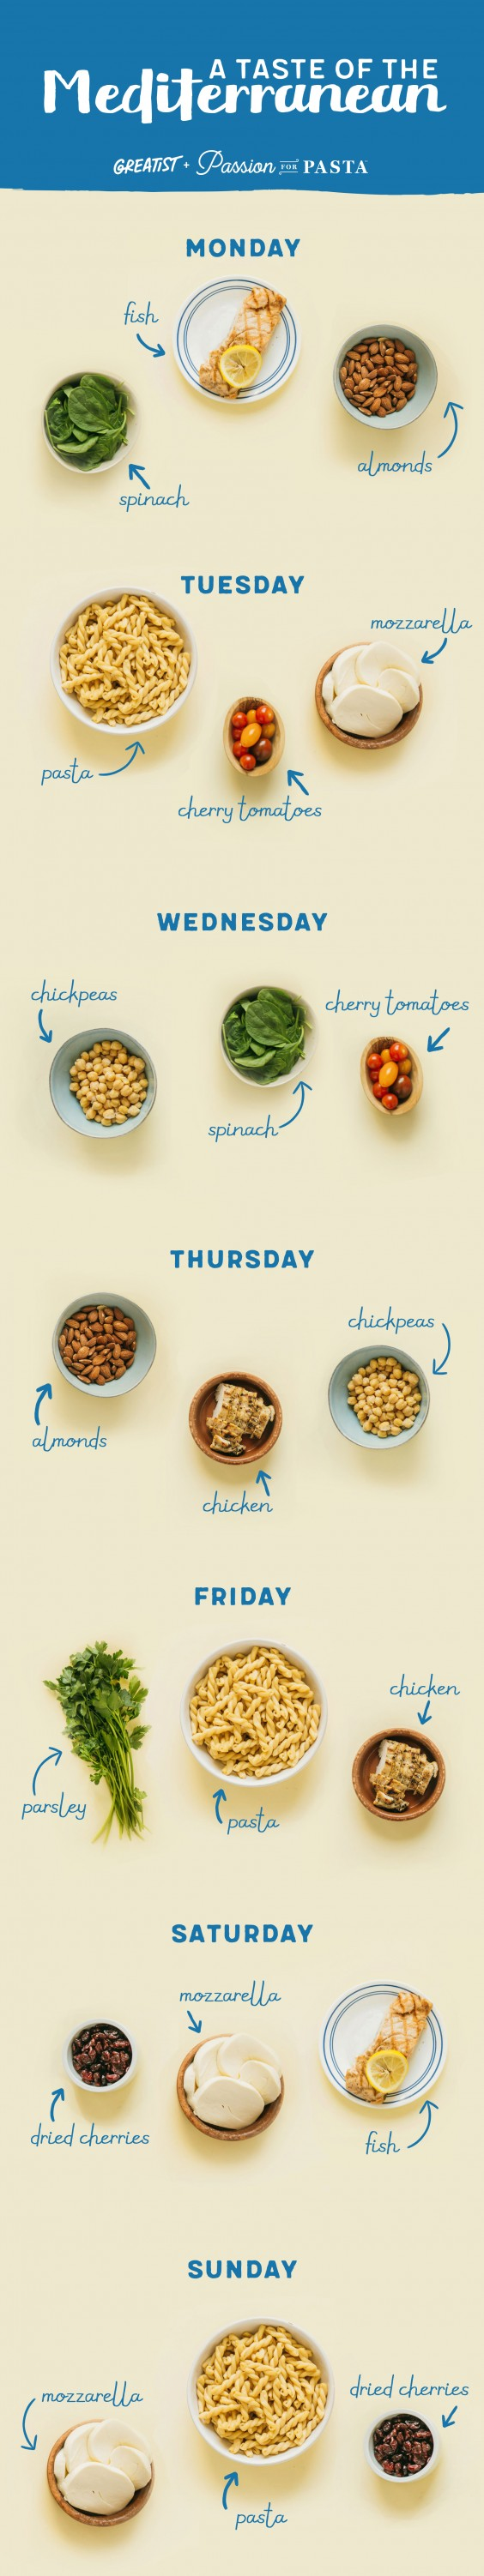 7 Mediterranean Diet Formulas for a Week's Worth of Easy Dinners - image 202301